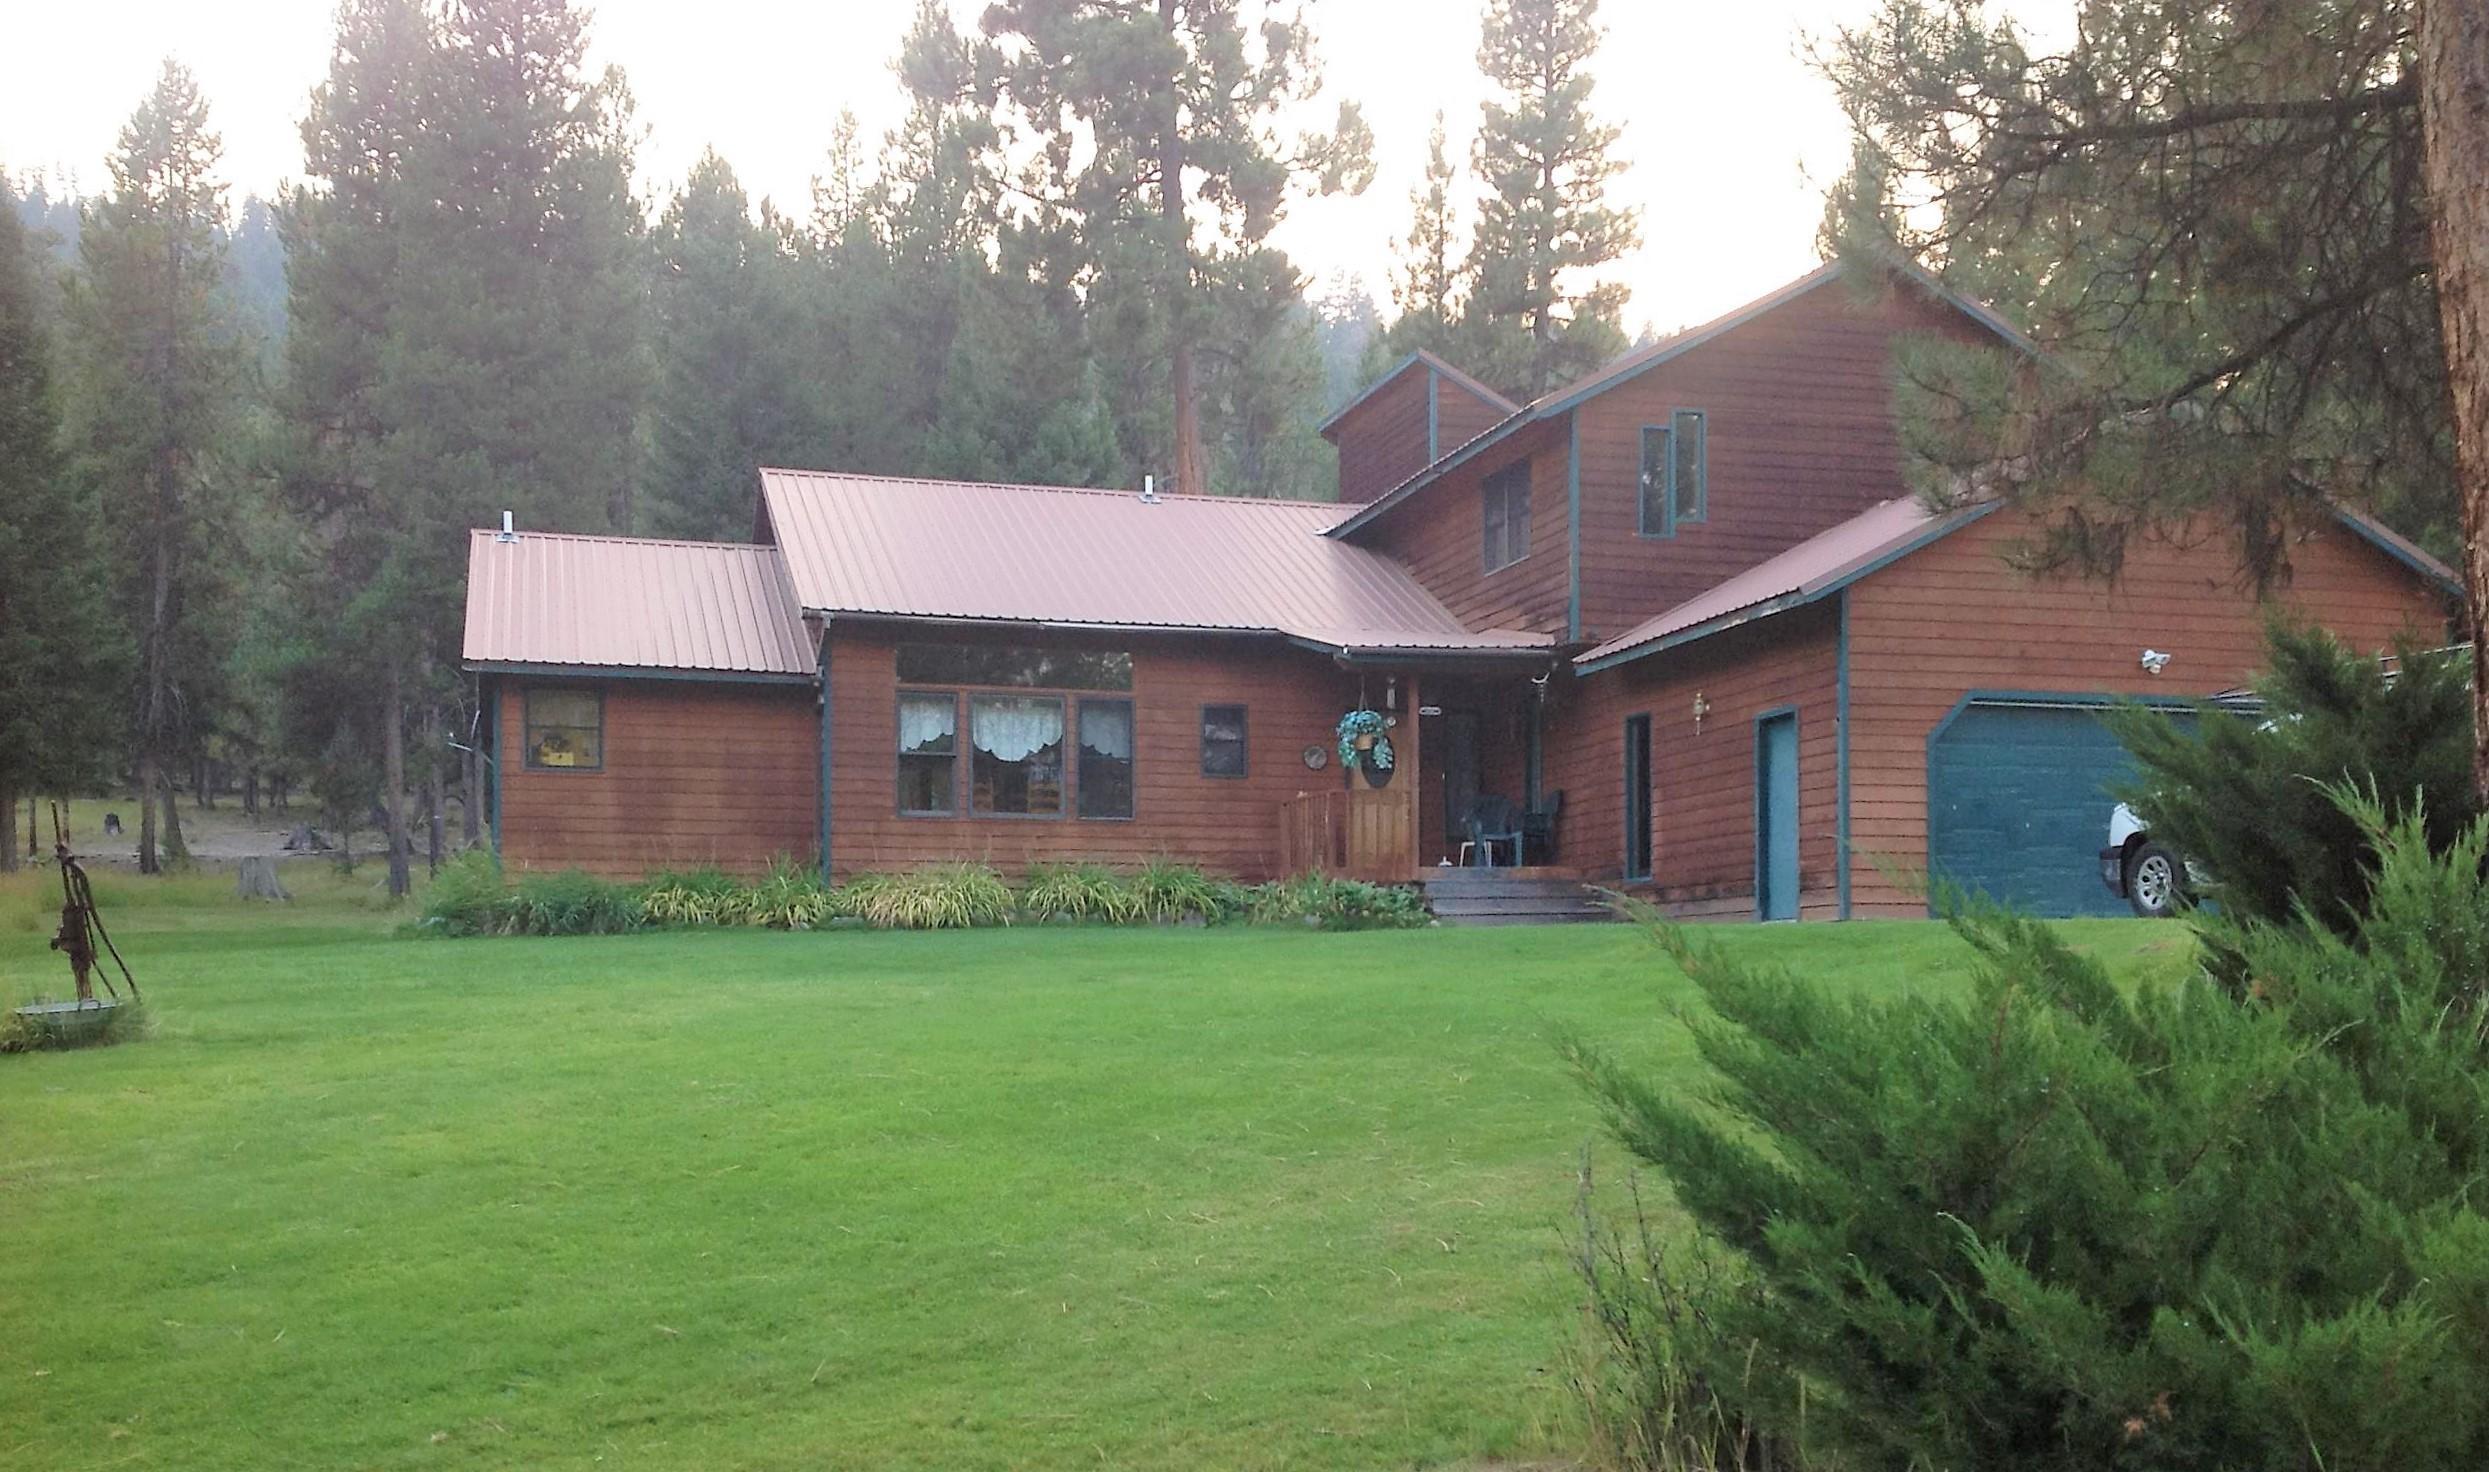 9249 Deer Walk Way, Darby, MT 59829